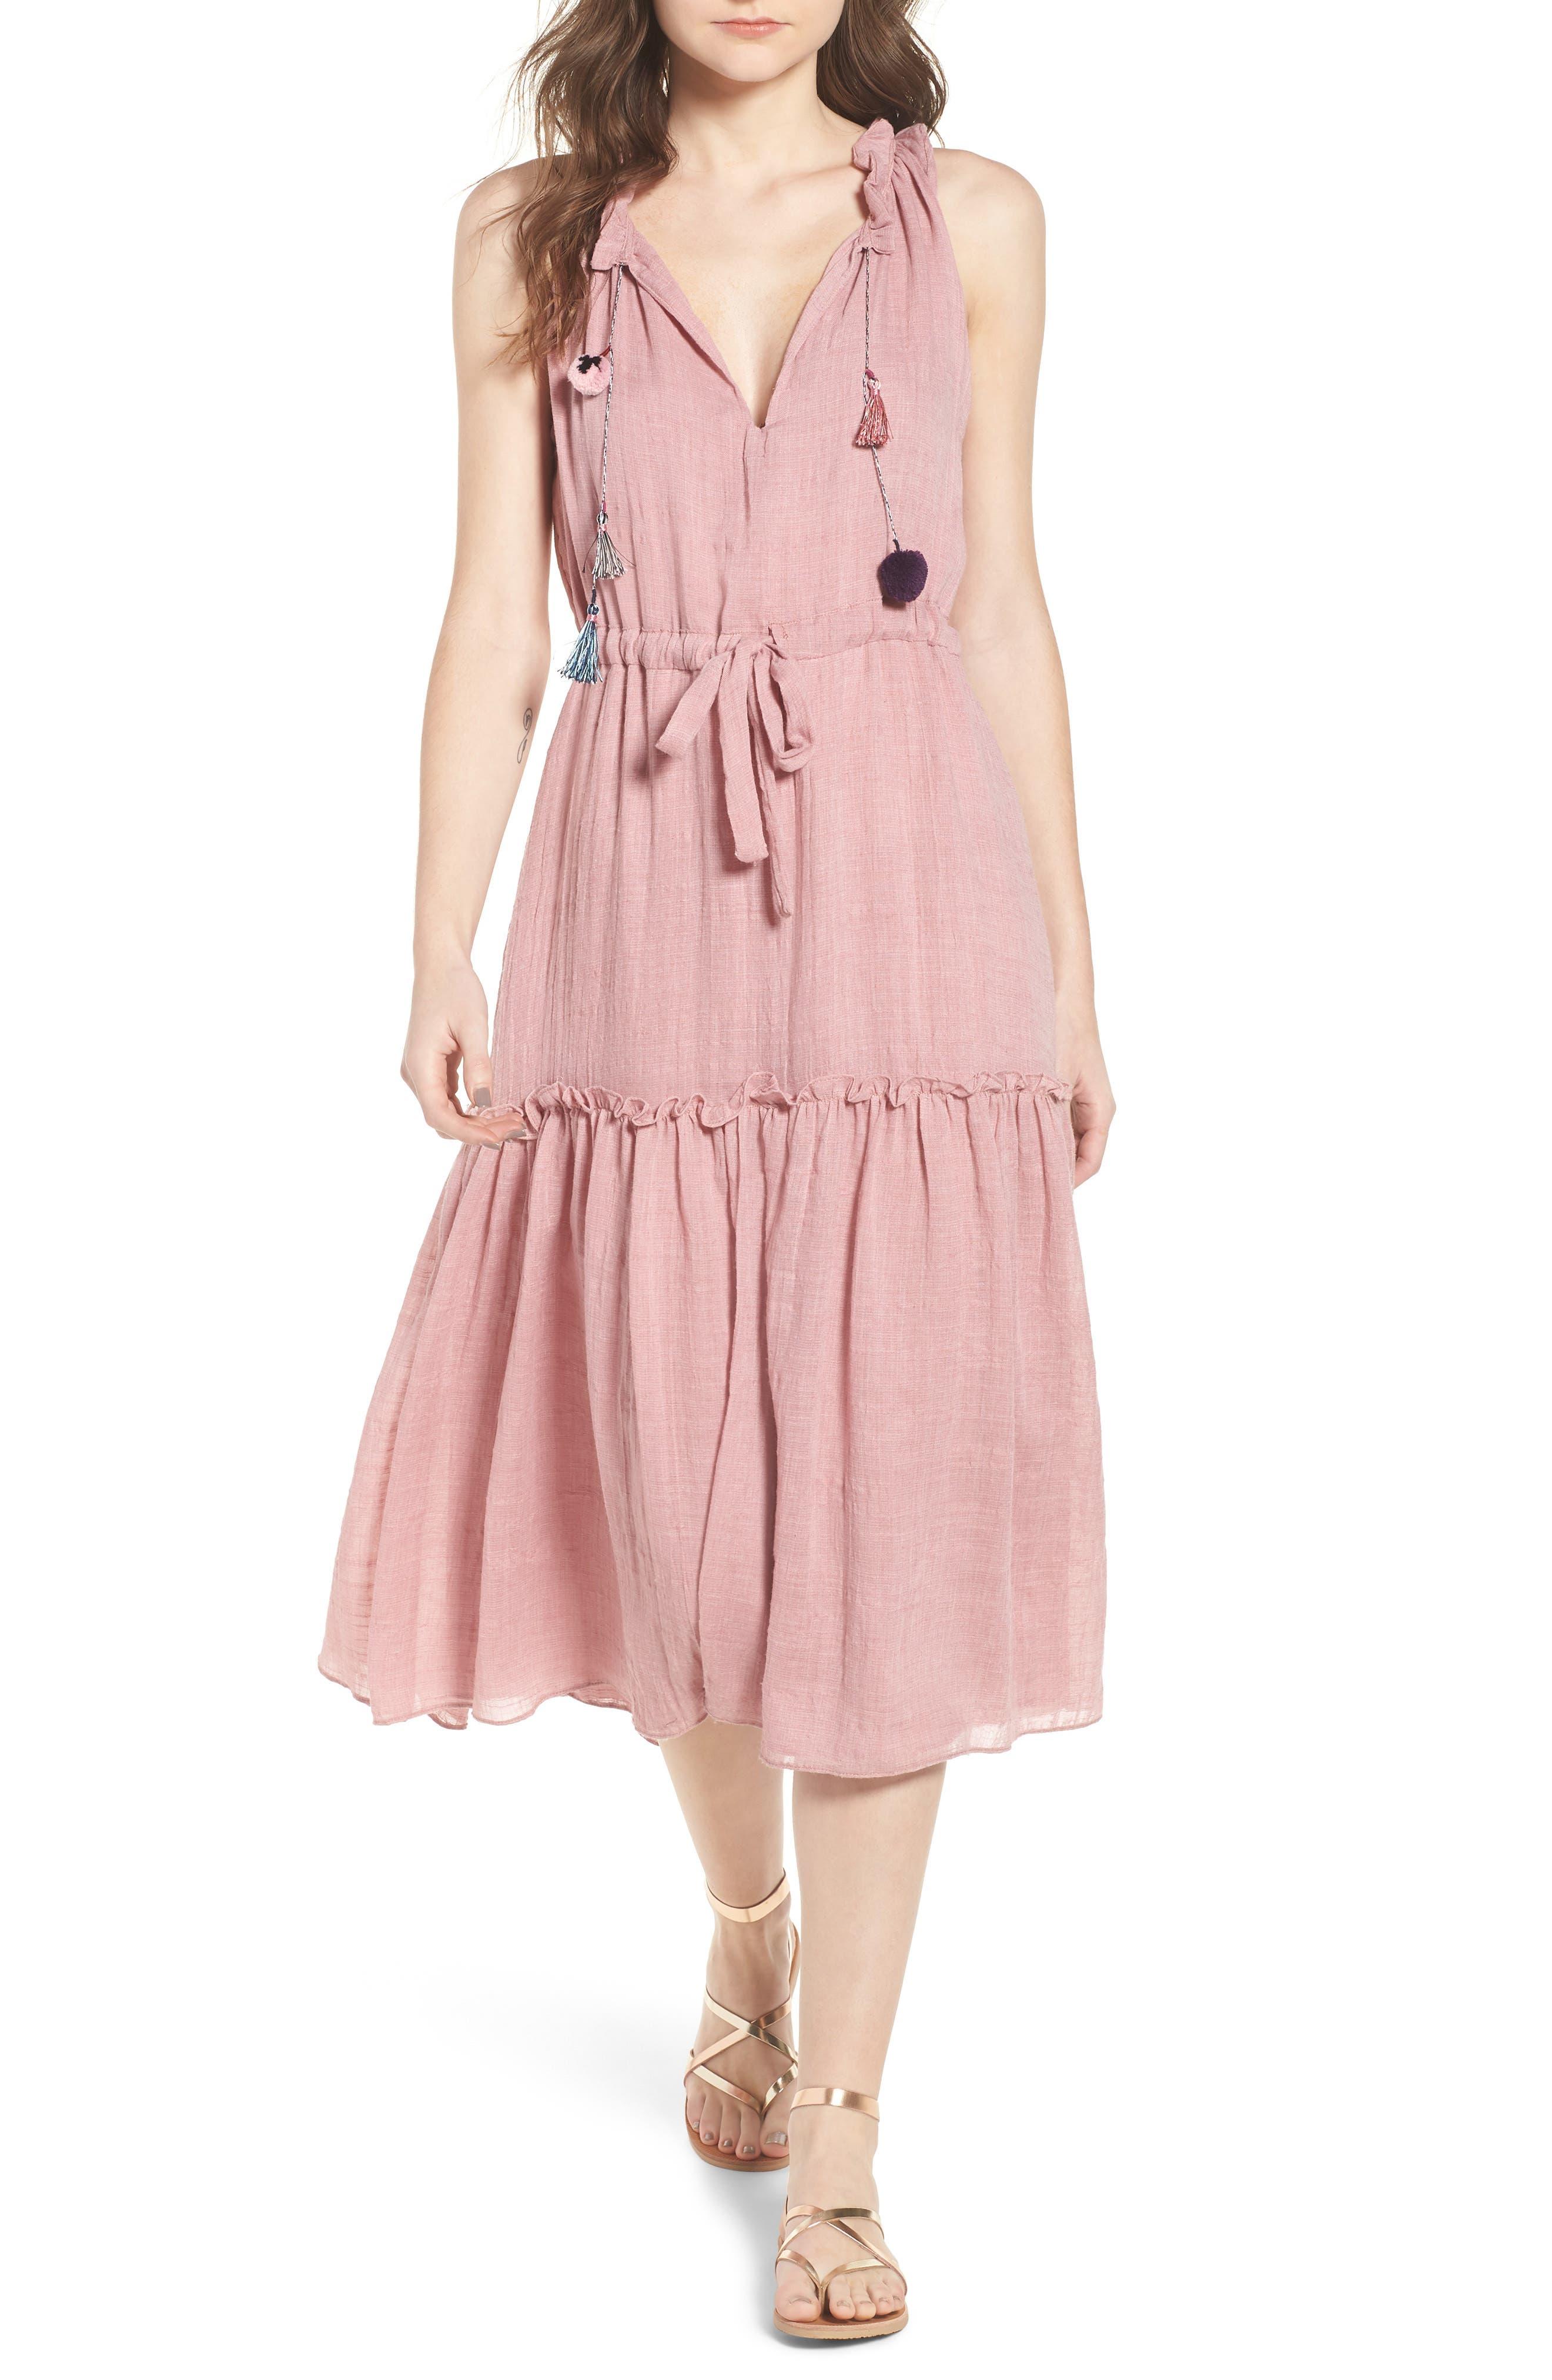 Nicolleta Tie Waist Midi Dress,                             Main thumbnail 1, color,                             Dusty Pink